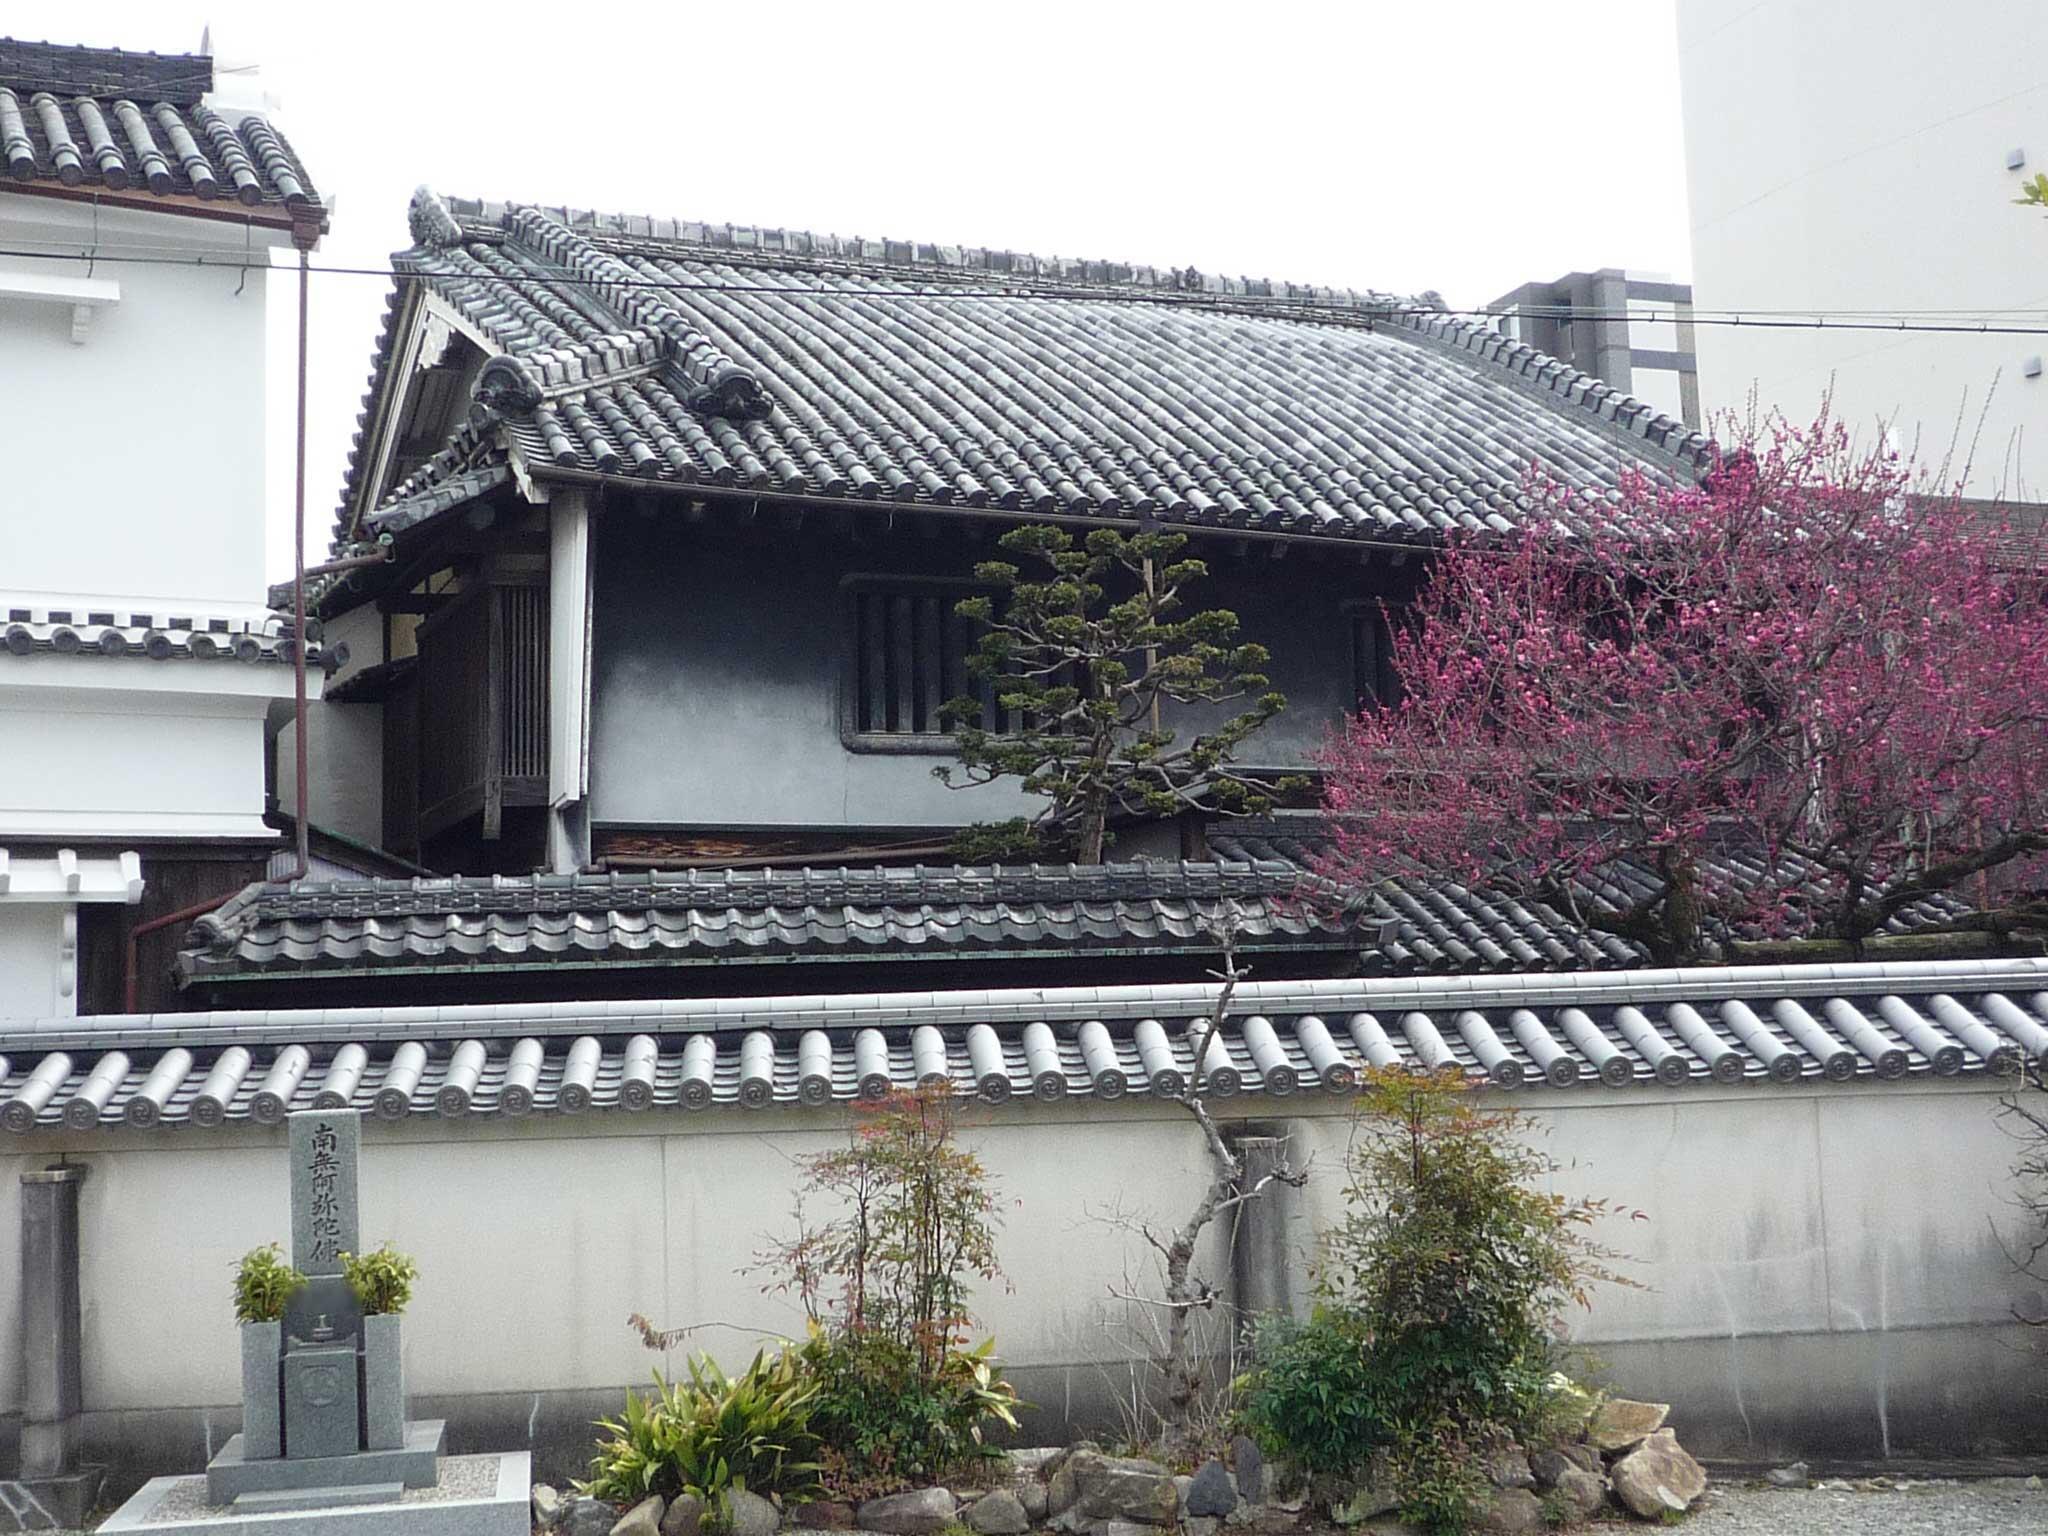 <p>主屋外観</p>西側の西光寺の境内から見る本瓦葺つし2階建、北面入母屋造(左側は蔵)